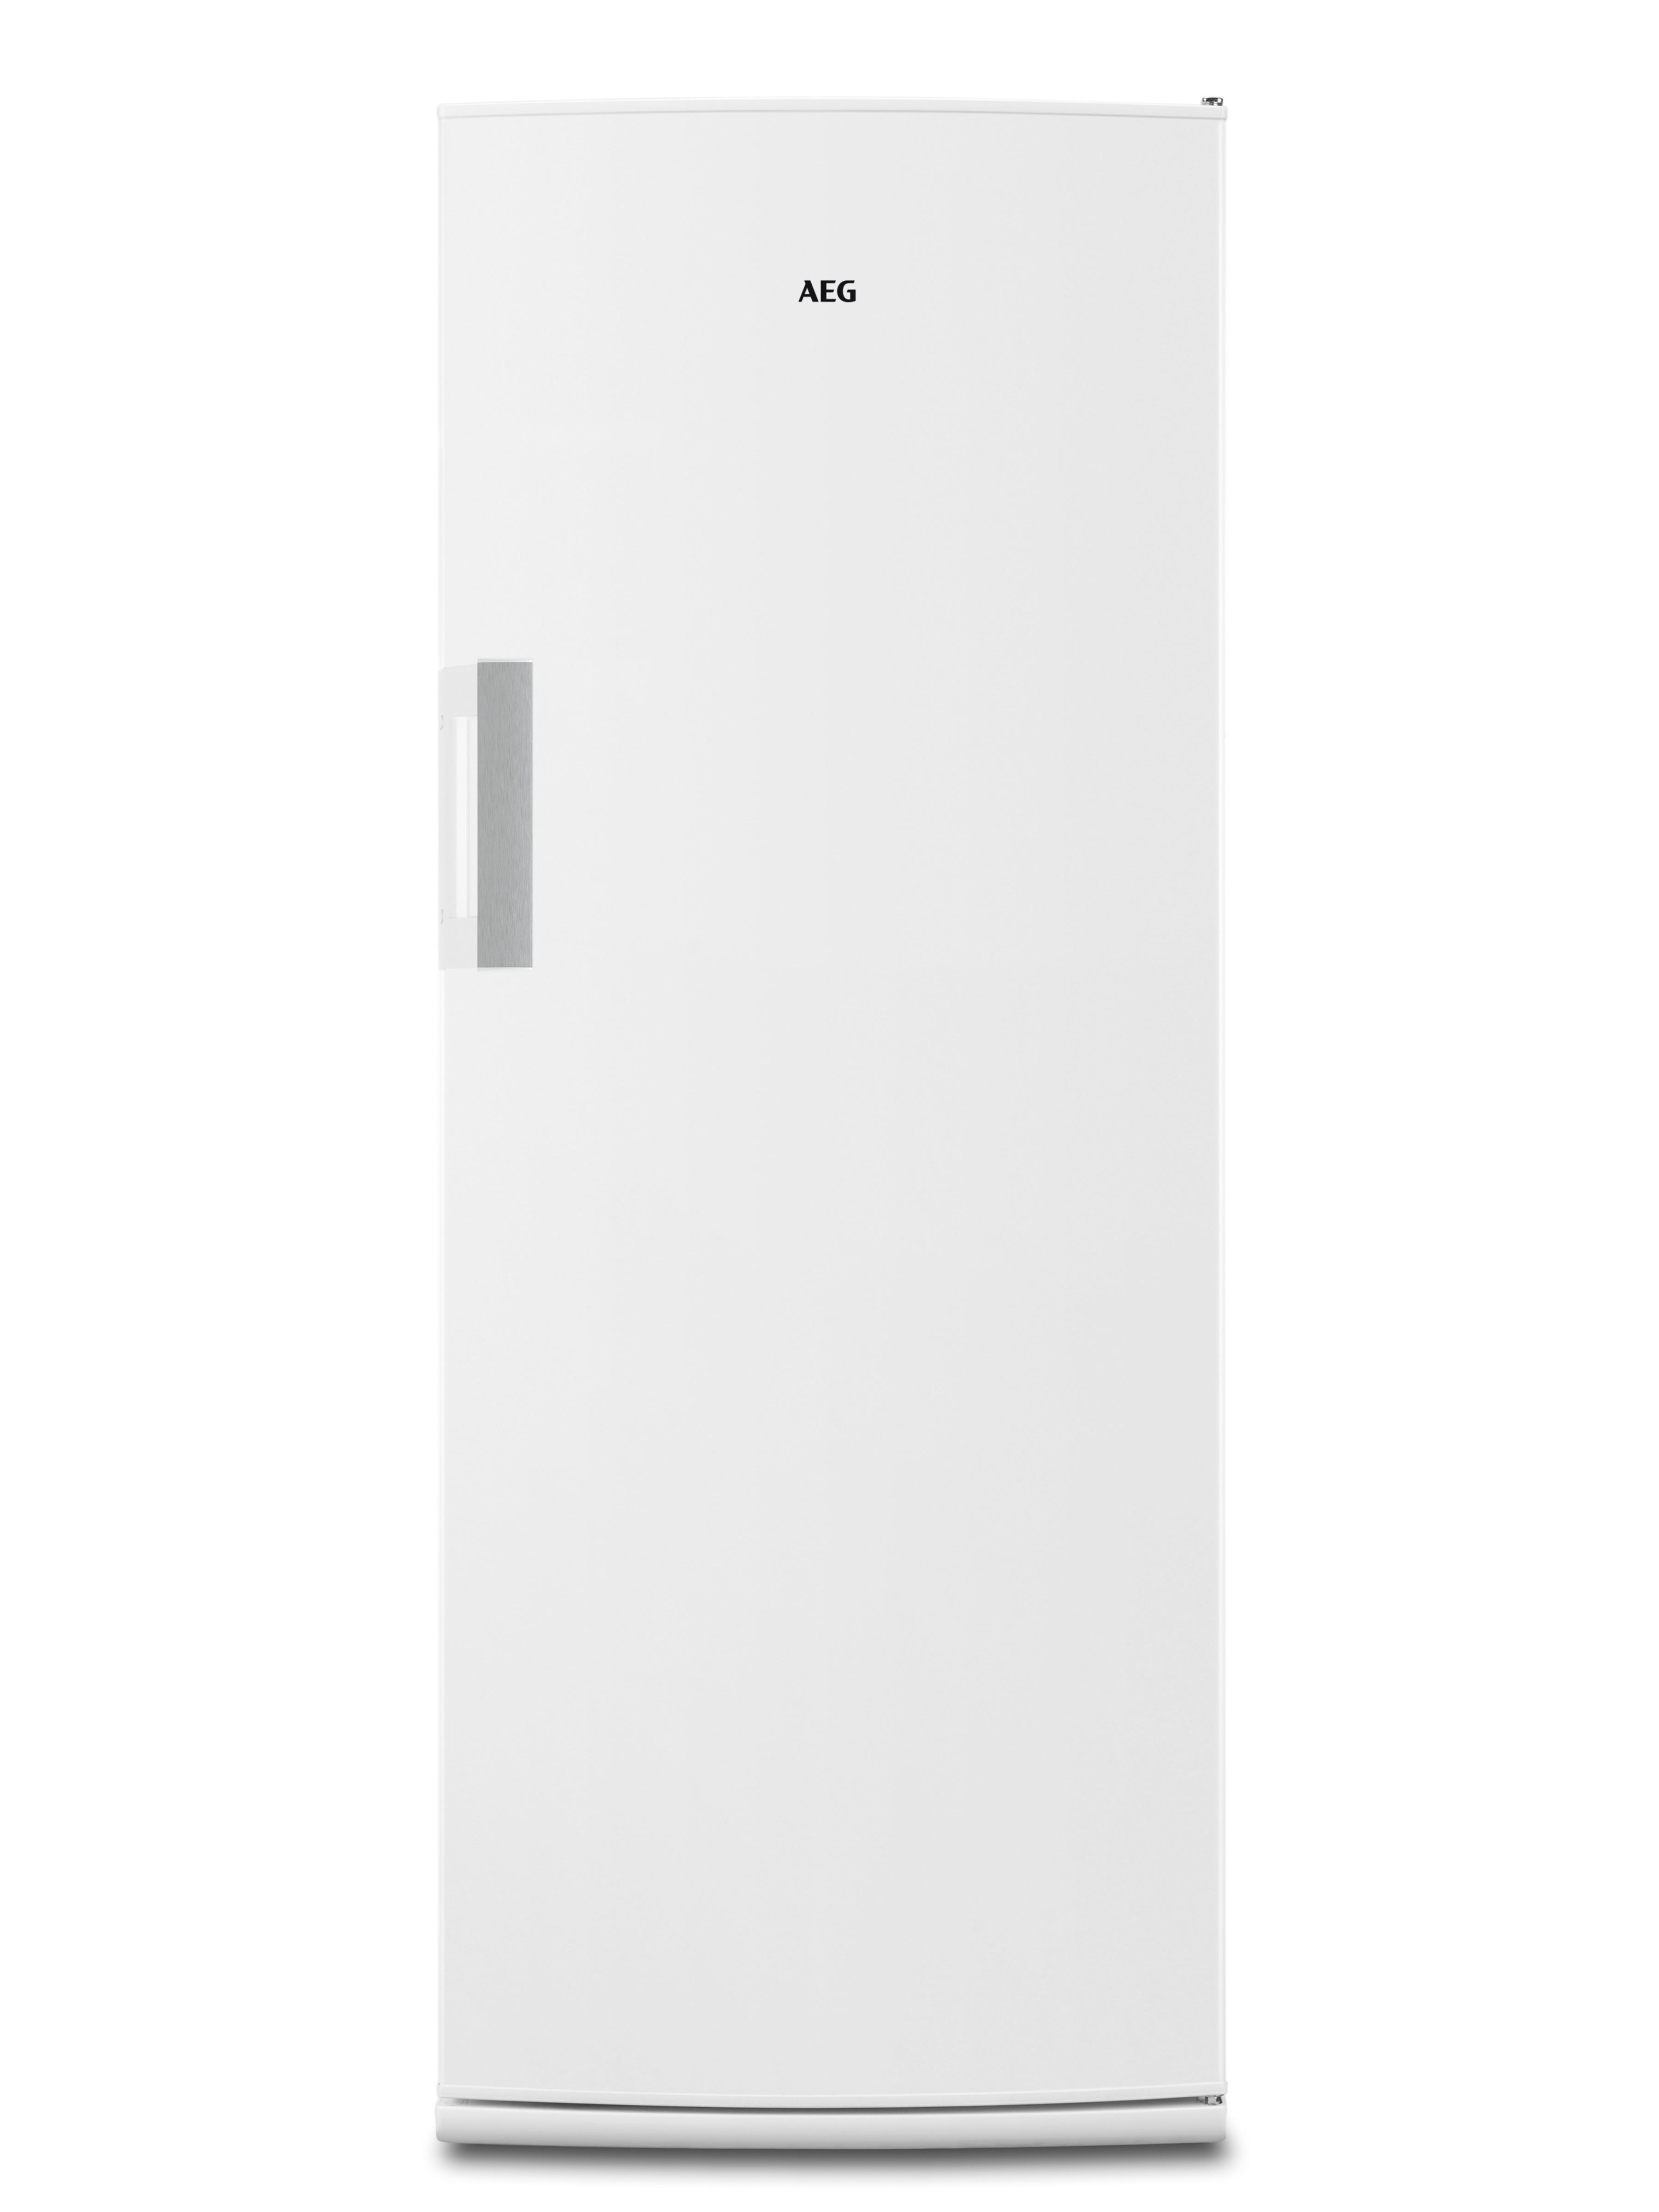 AEG koelkast zonder vriesvak RKB63221DW wit